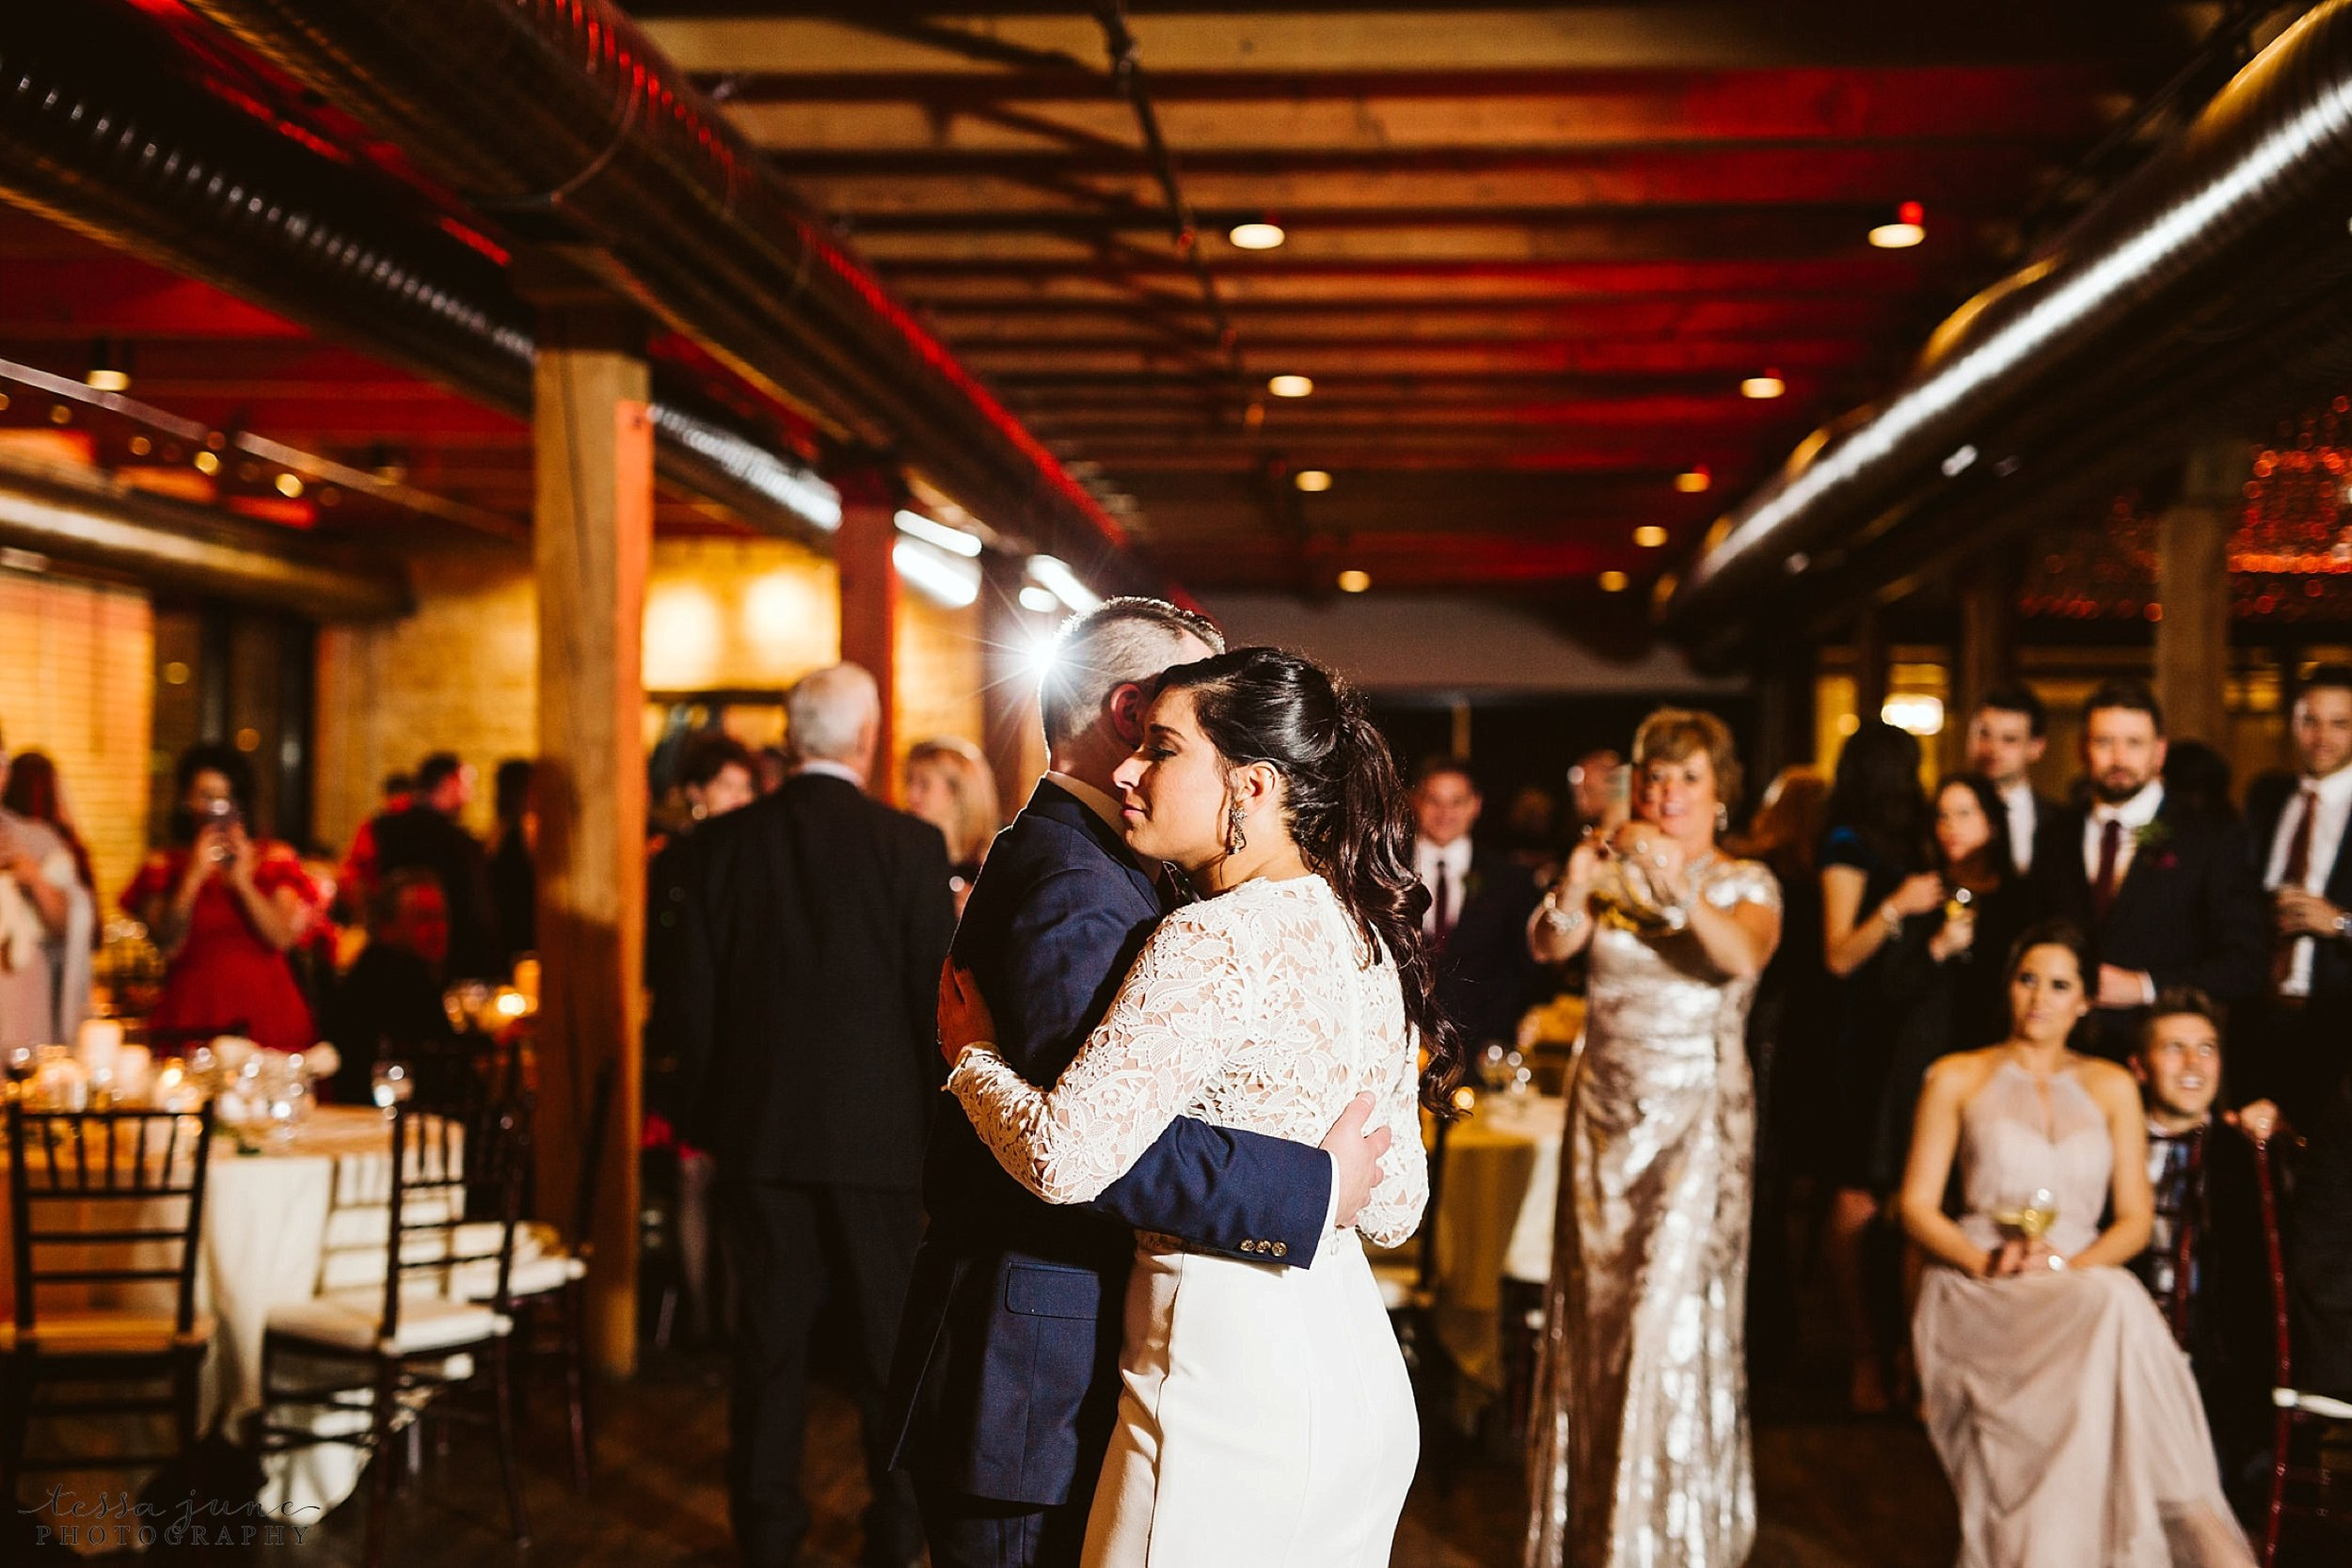 minneapolis-event-center-winter-romantic-snow-wedding-december-210.jpg